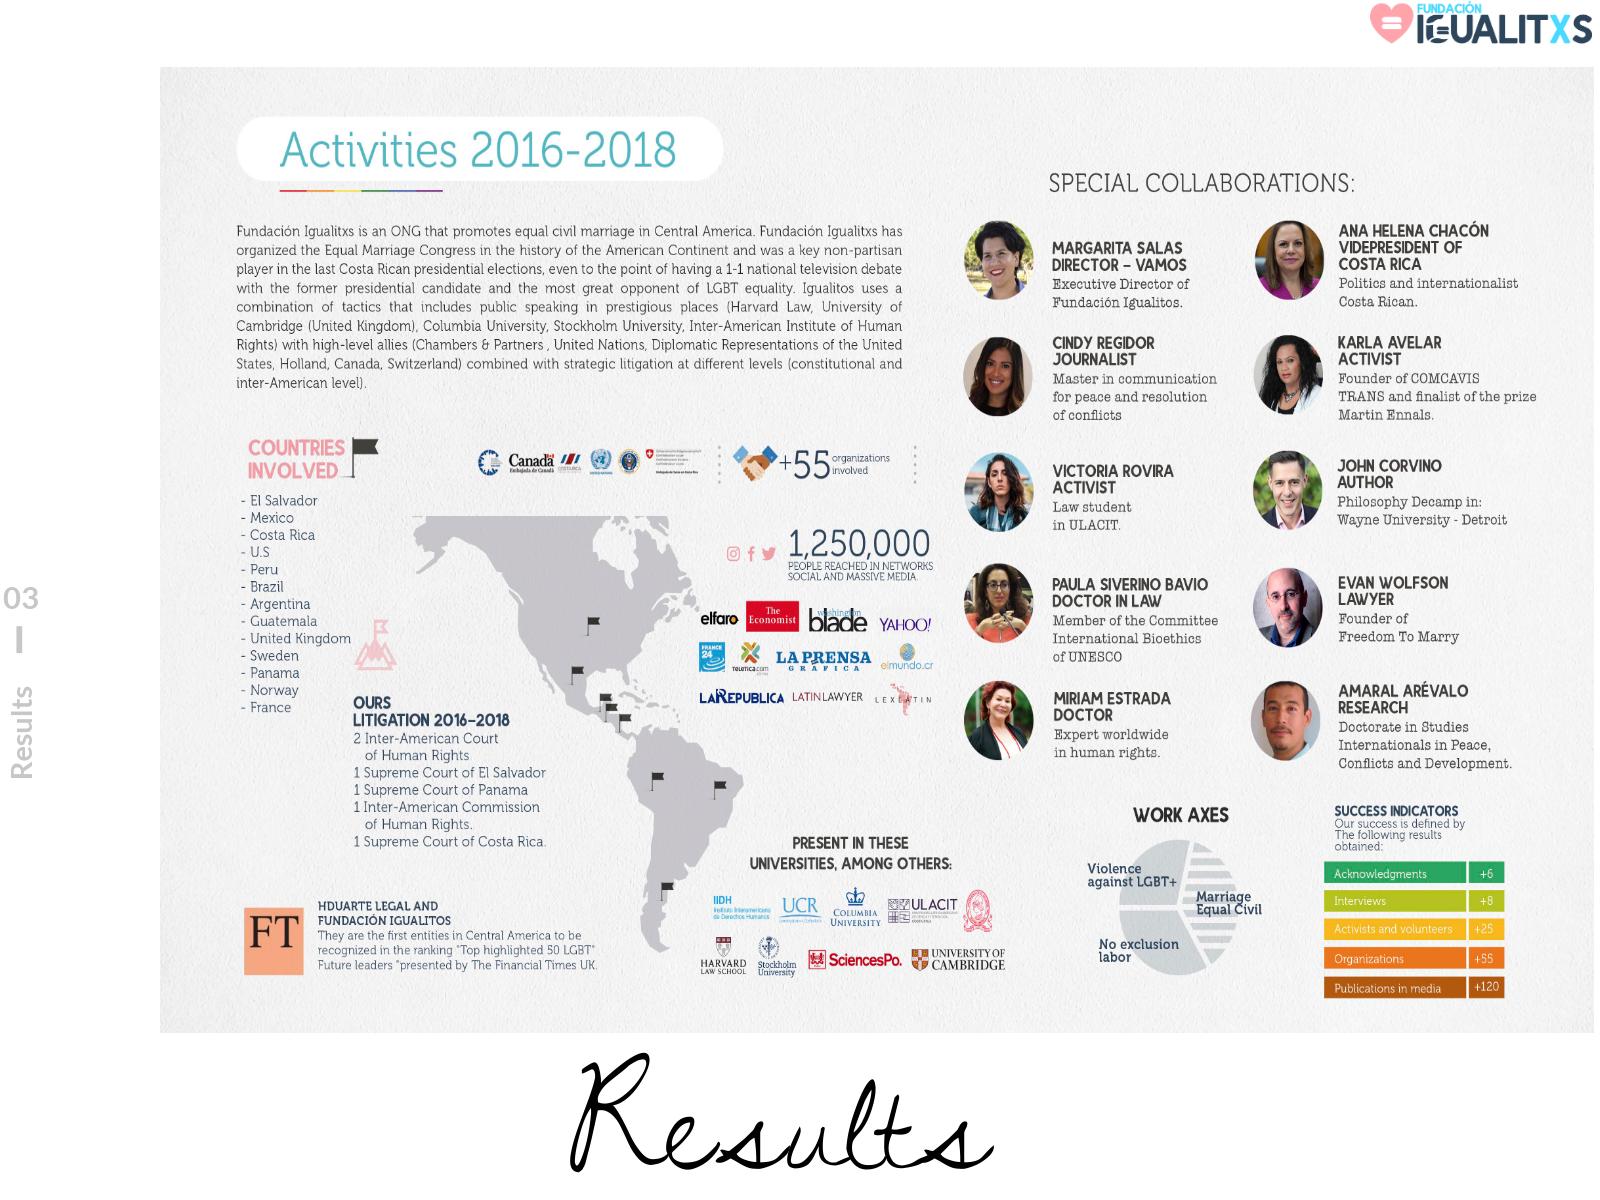 Fundacion Igualitos-Igualitos-Ana-Helena-Chacón-Karla-Avelar-Miriam-Estrada-Castrillo-Margarita-Salas-Paula-Siverino-Bavio-Herman-Duarte-Costa-Rica-The-Economist-Harvard